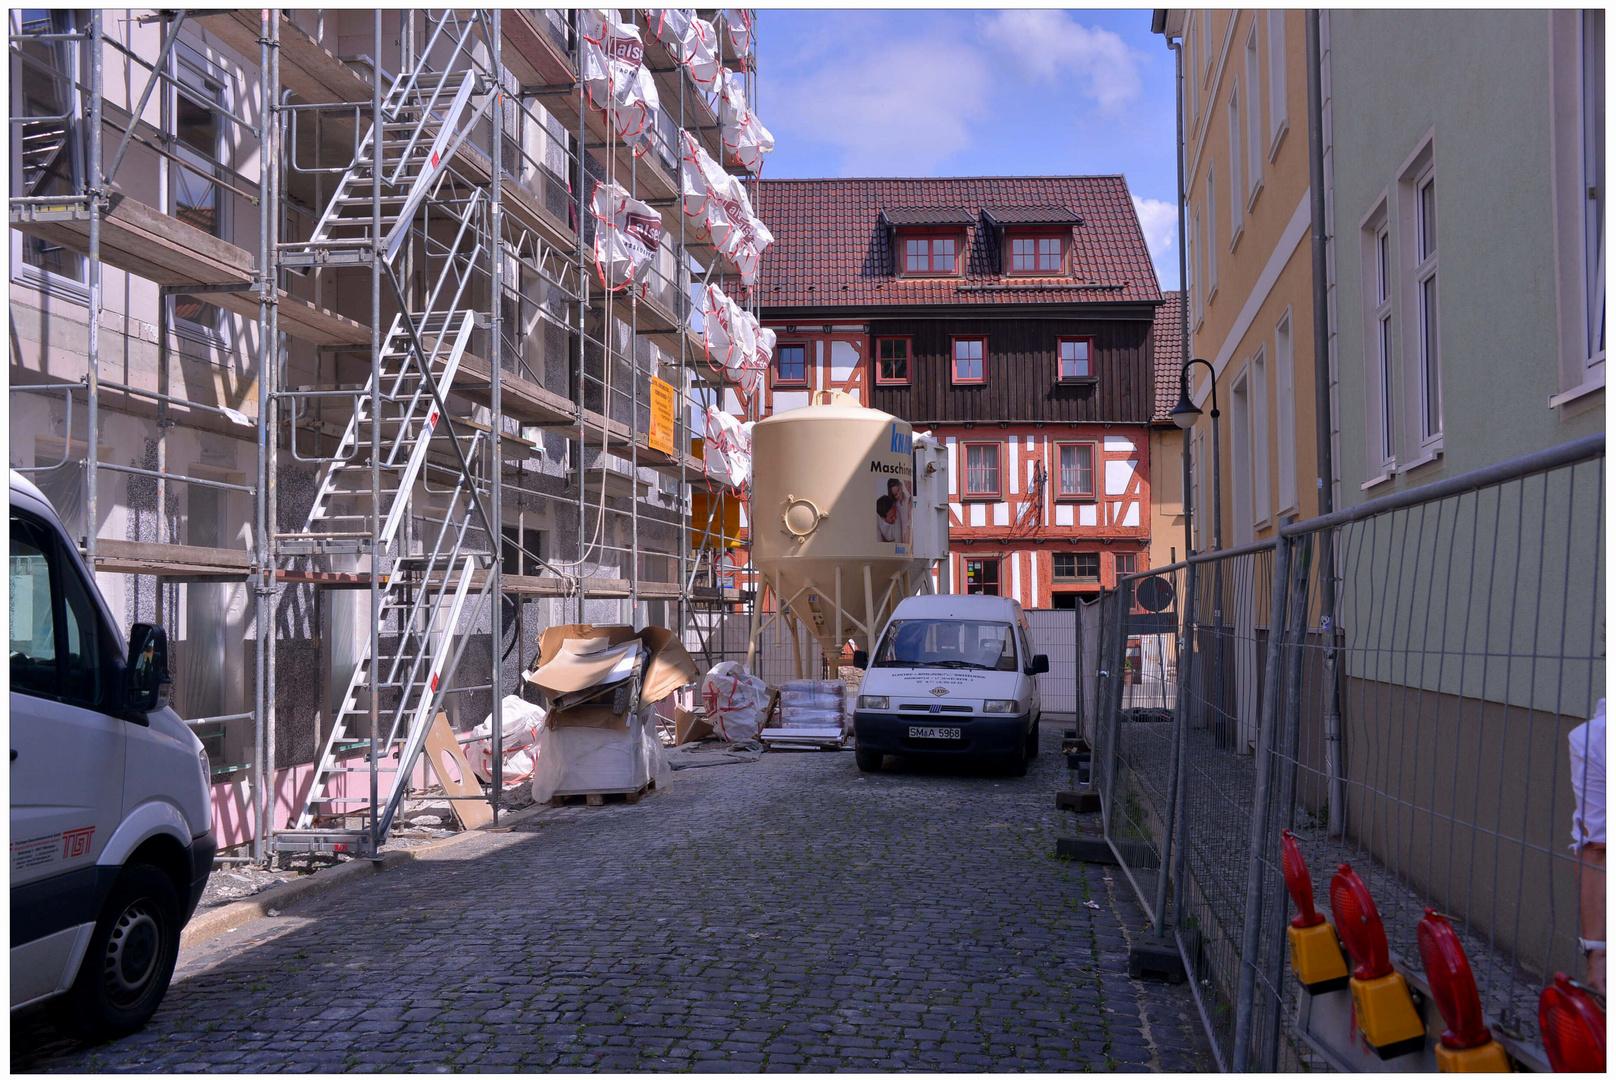 imagen de mi nueva cámara VIII - Meiningen, obras